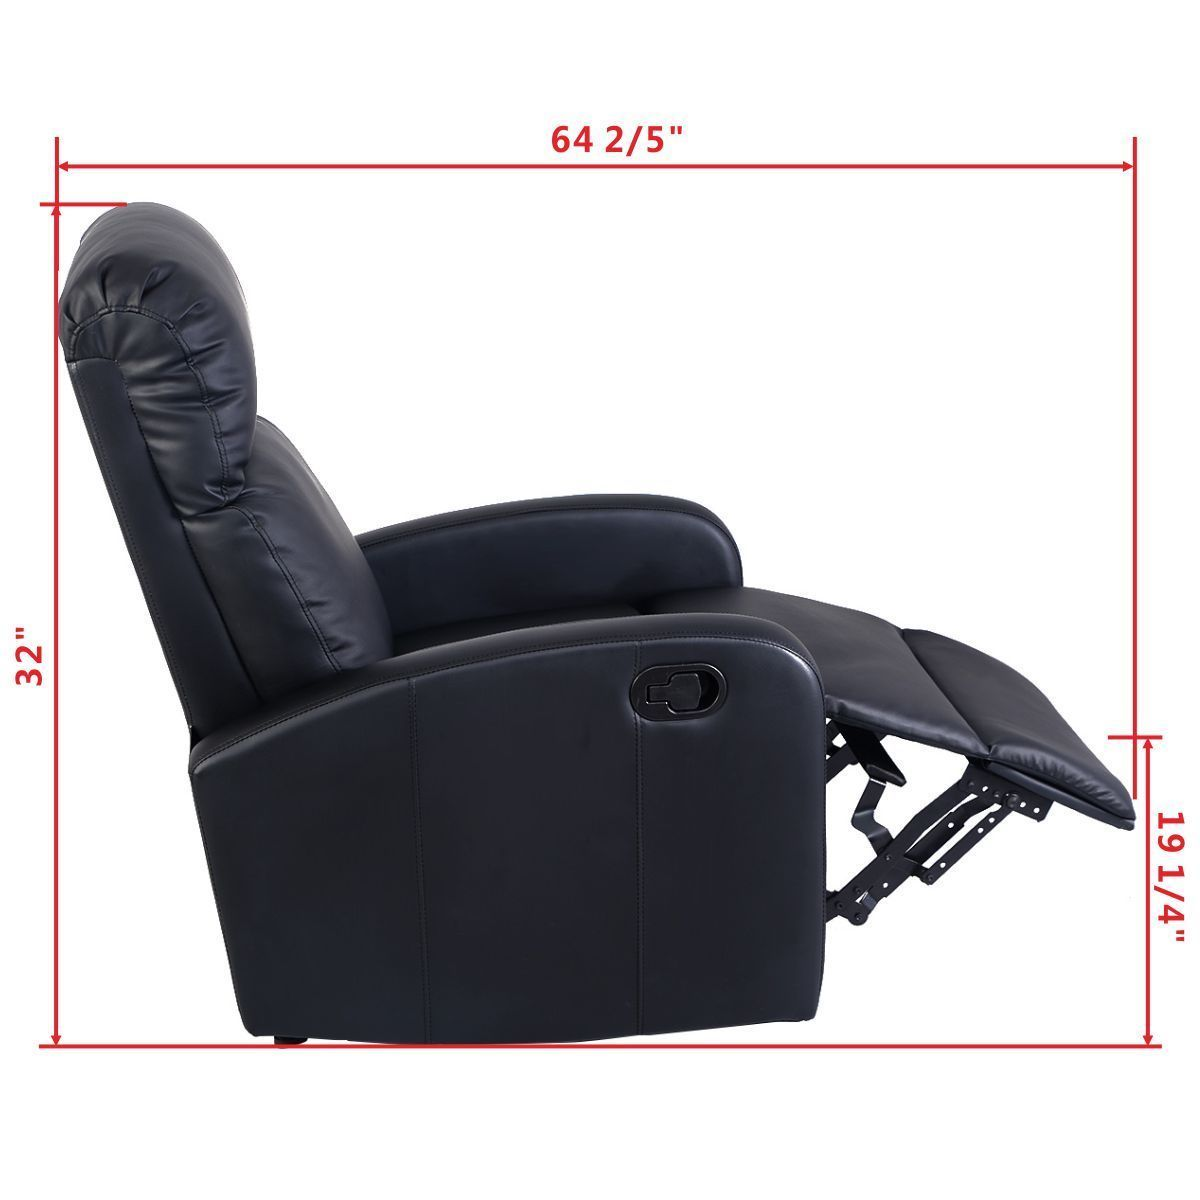 Sensational Giantex Manual Recliner Sofa Chair Black Home Living Room Dailytribune Chair Design For Home Dailytribuneorg